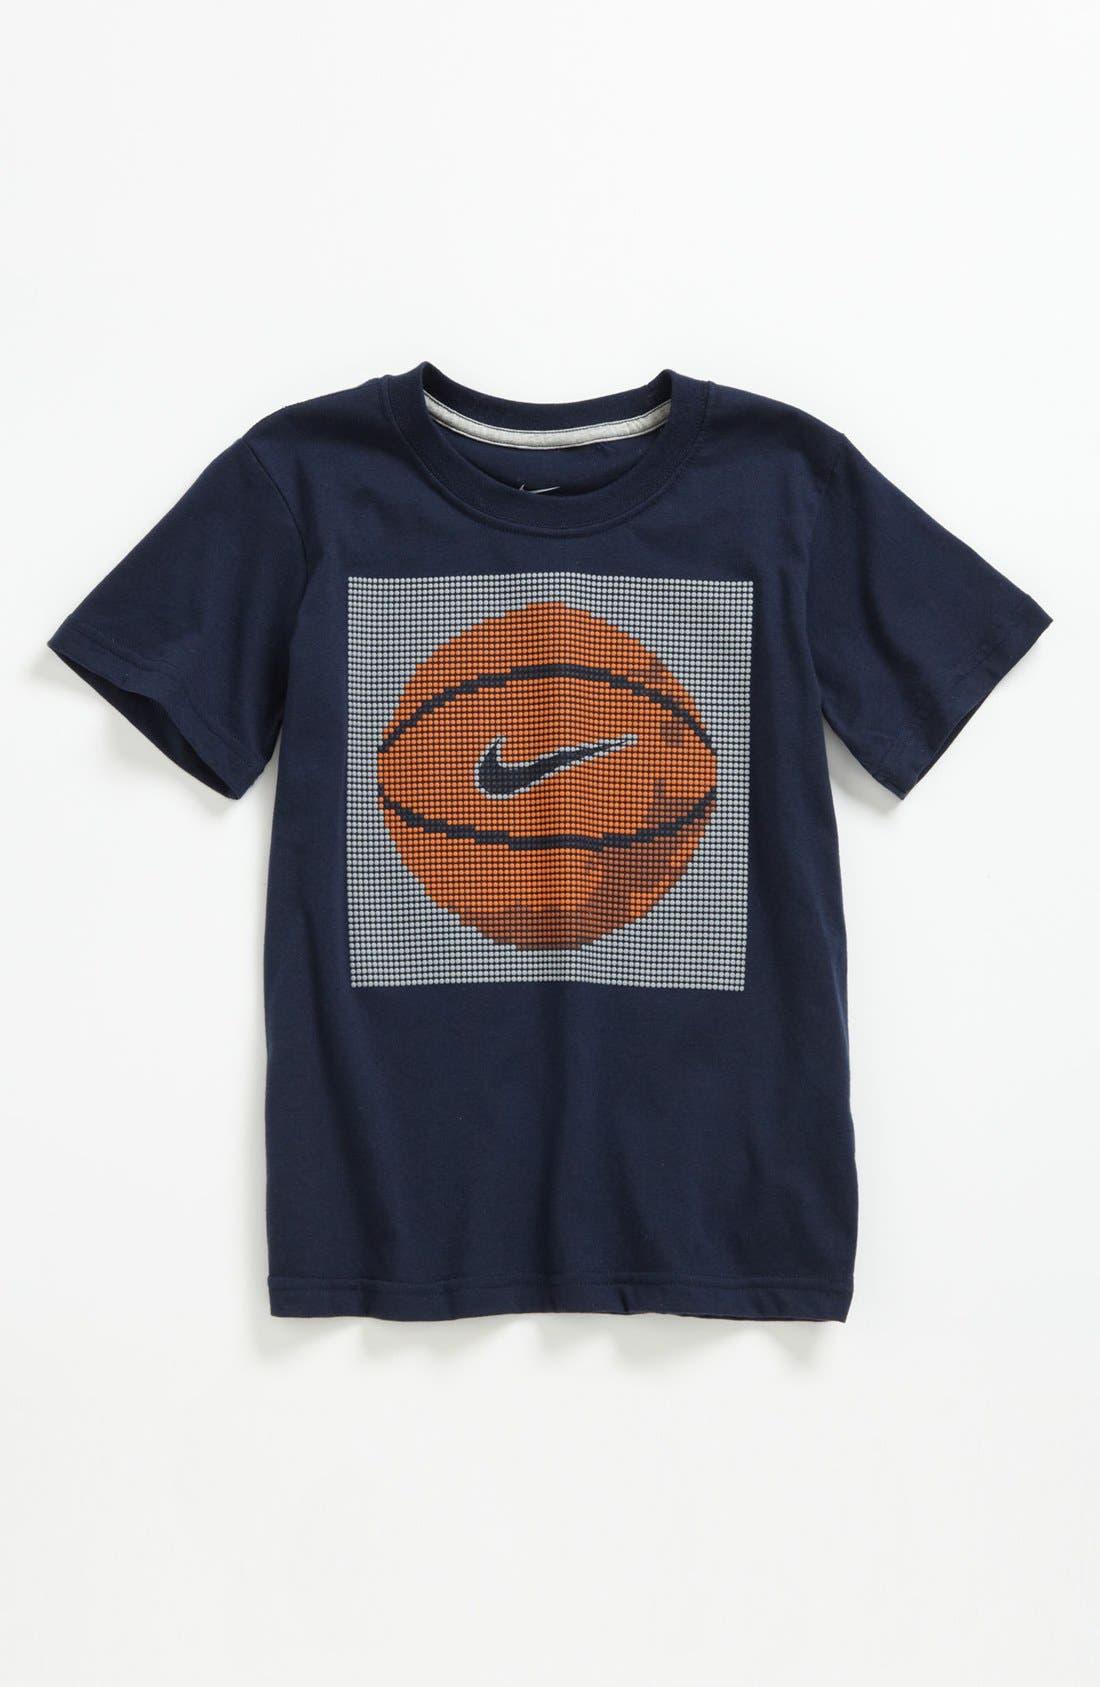 Main Image - Nike 'Basketball' T-Shirt (Little Boys)